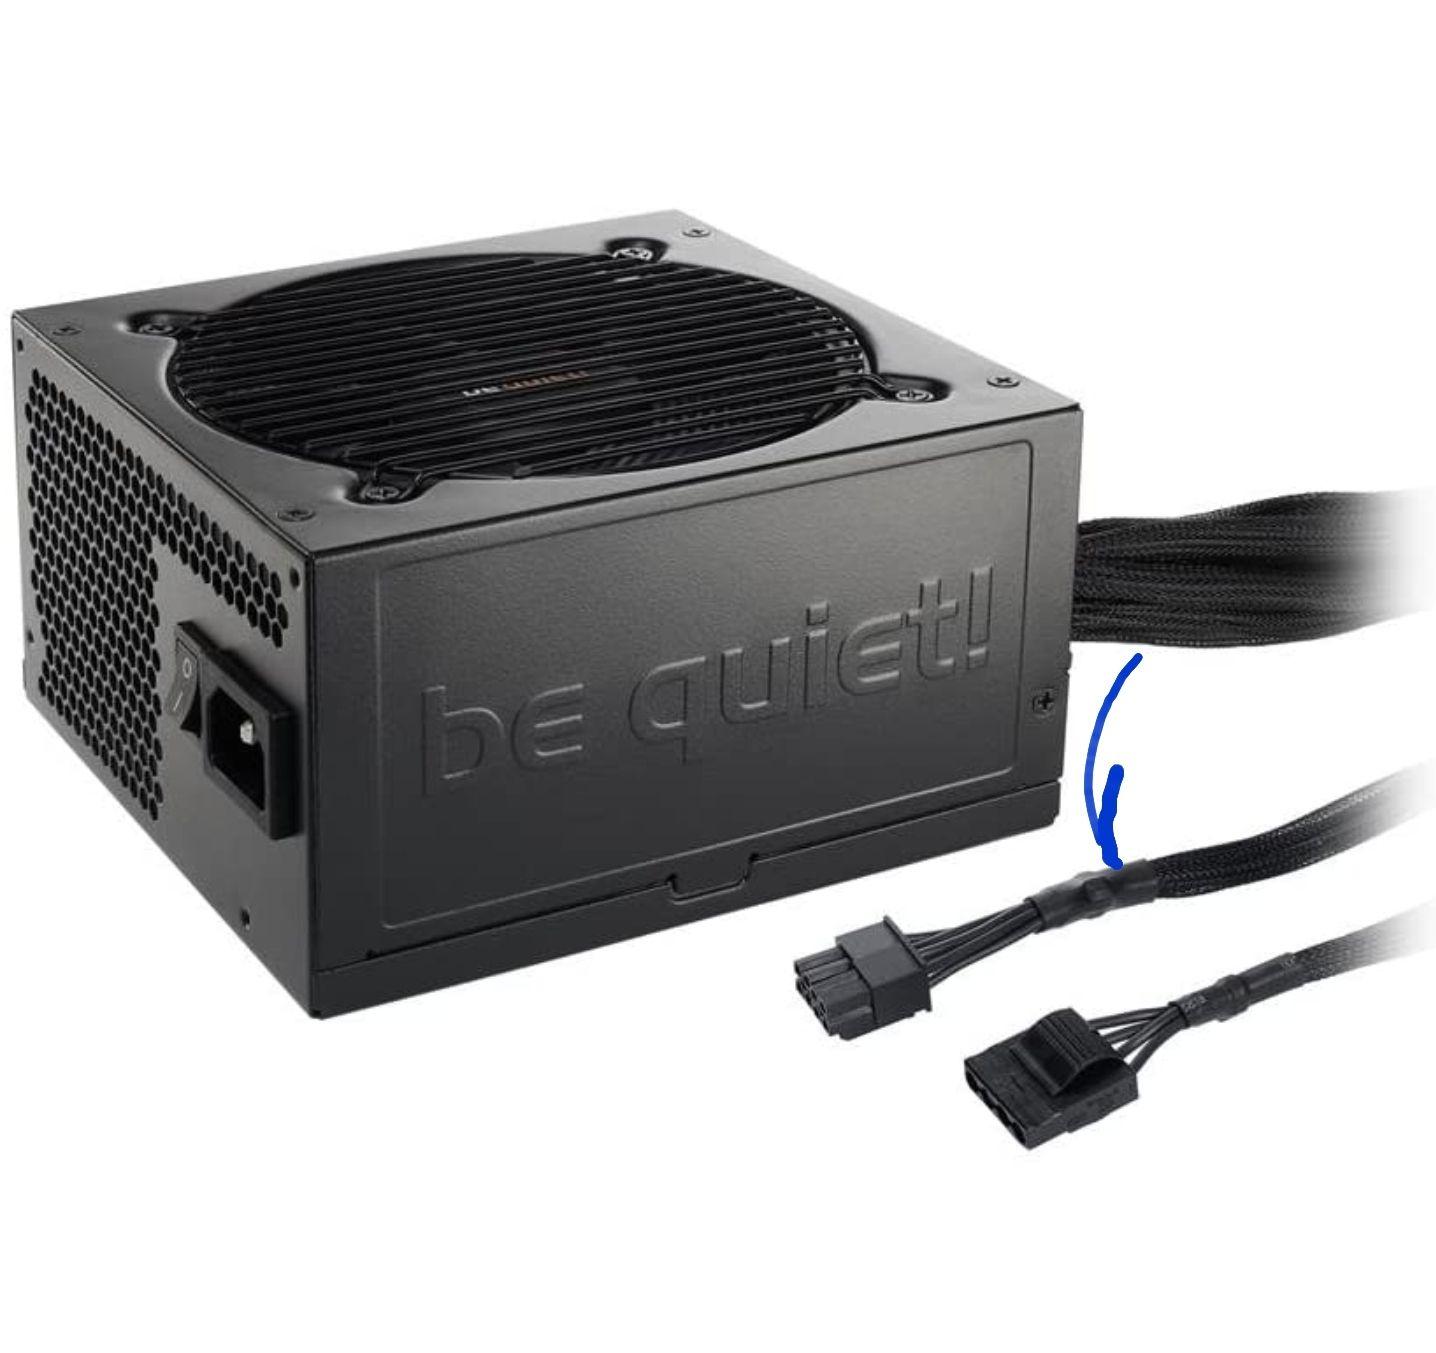 be quiet! Pure Power 11 ATX PC Netzteil 700W 80+Gold BN295